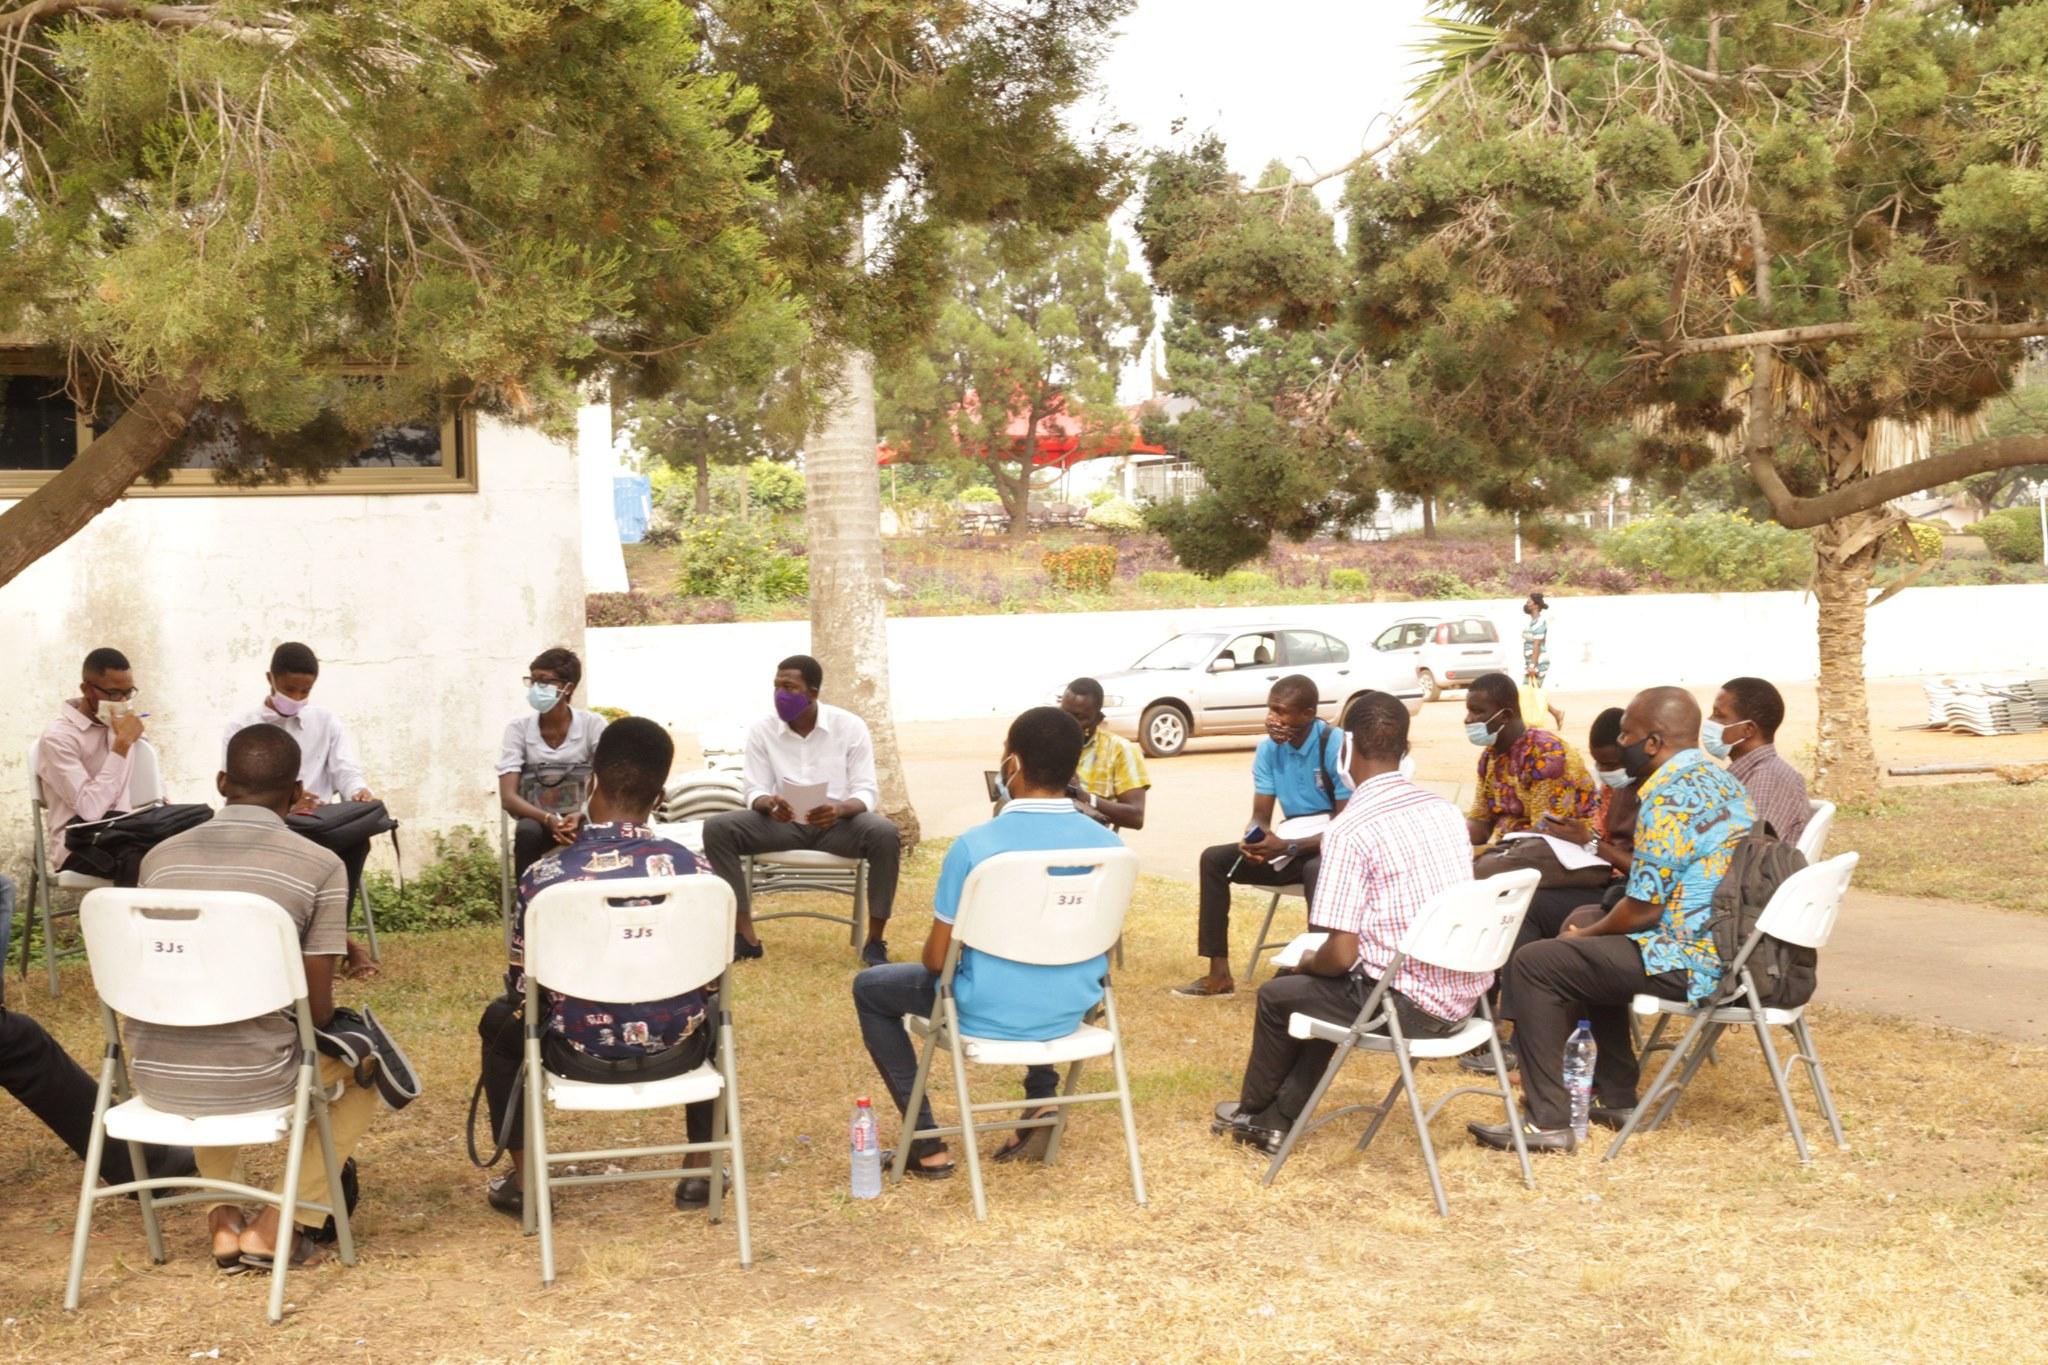 Private Schools begin training of teachers on CCP Curriculum 4